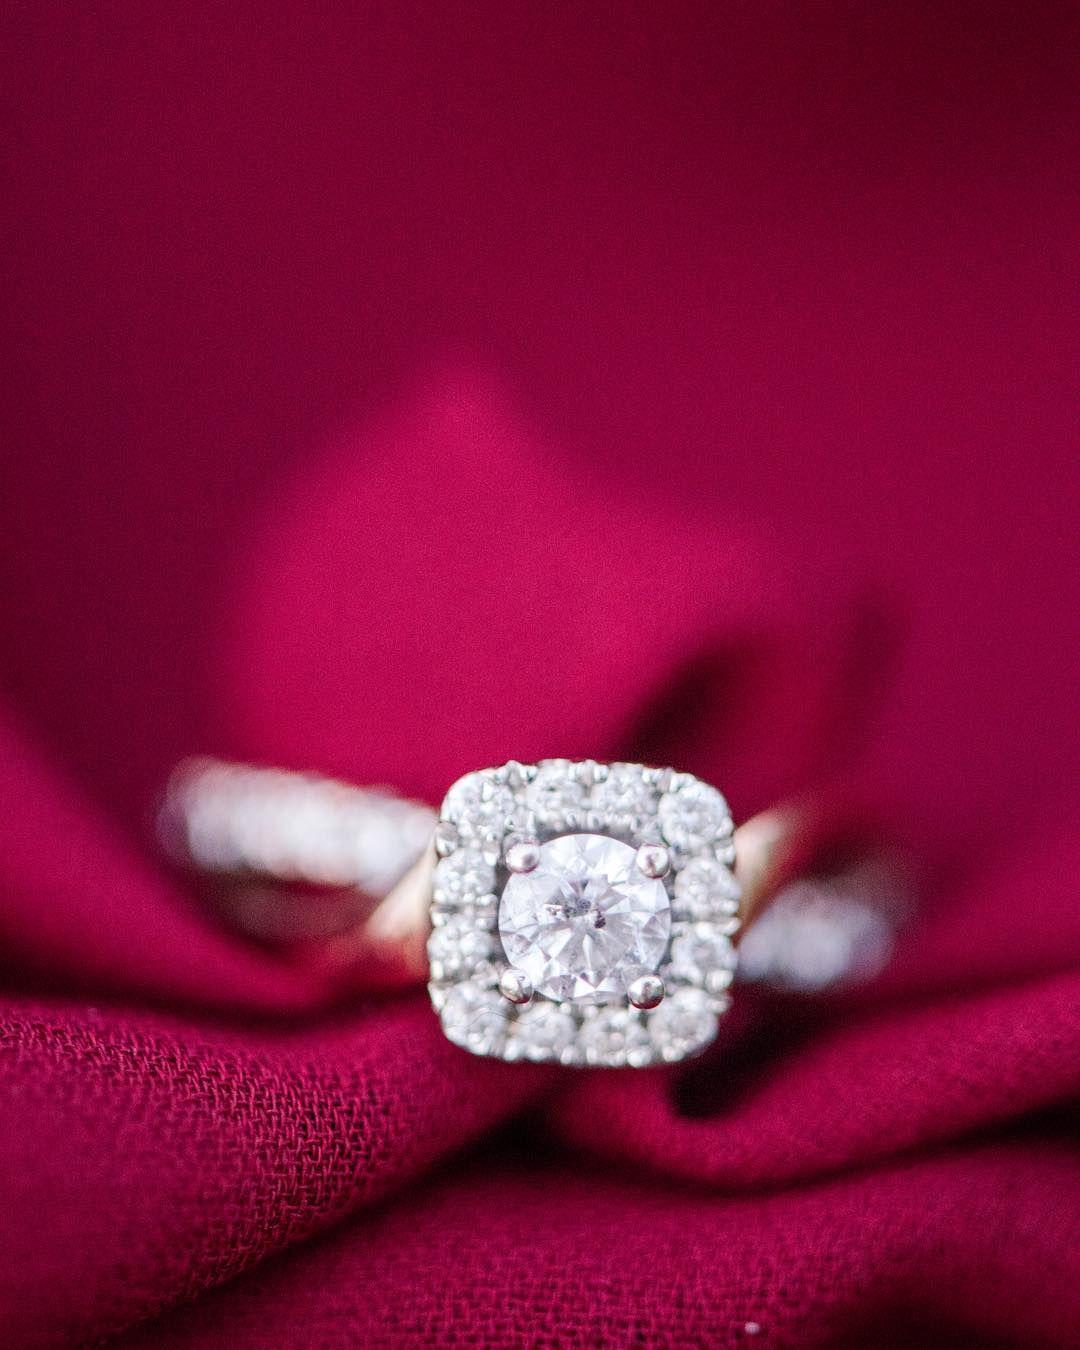 Infinity Wedding Band Engagement Ring Columbus Ohio Photographer Kelsie Lynn Photography